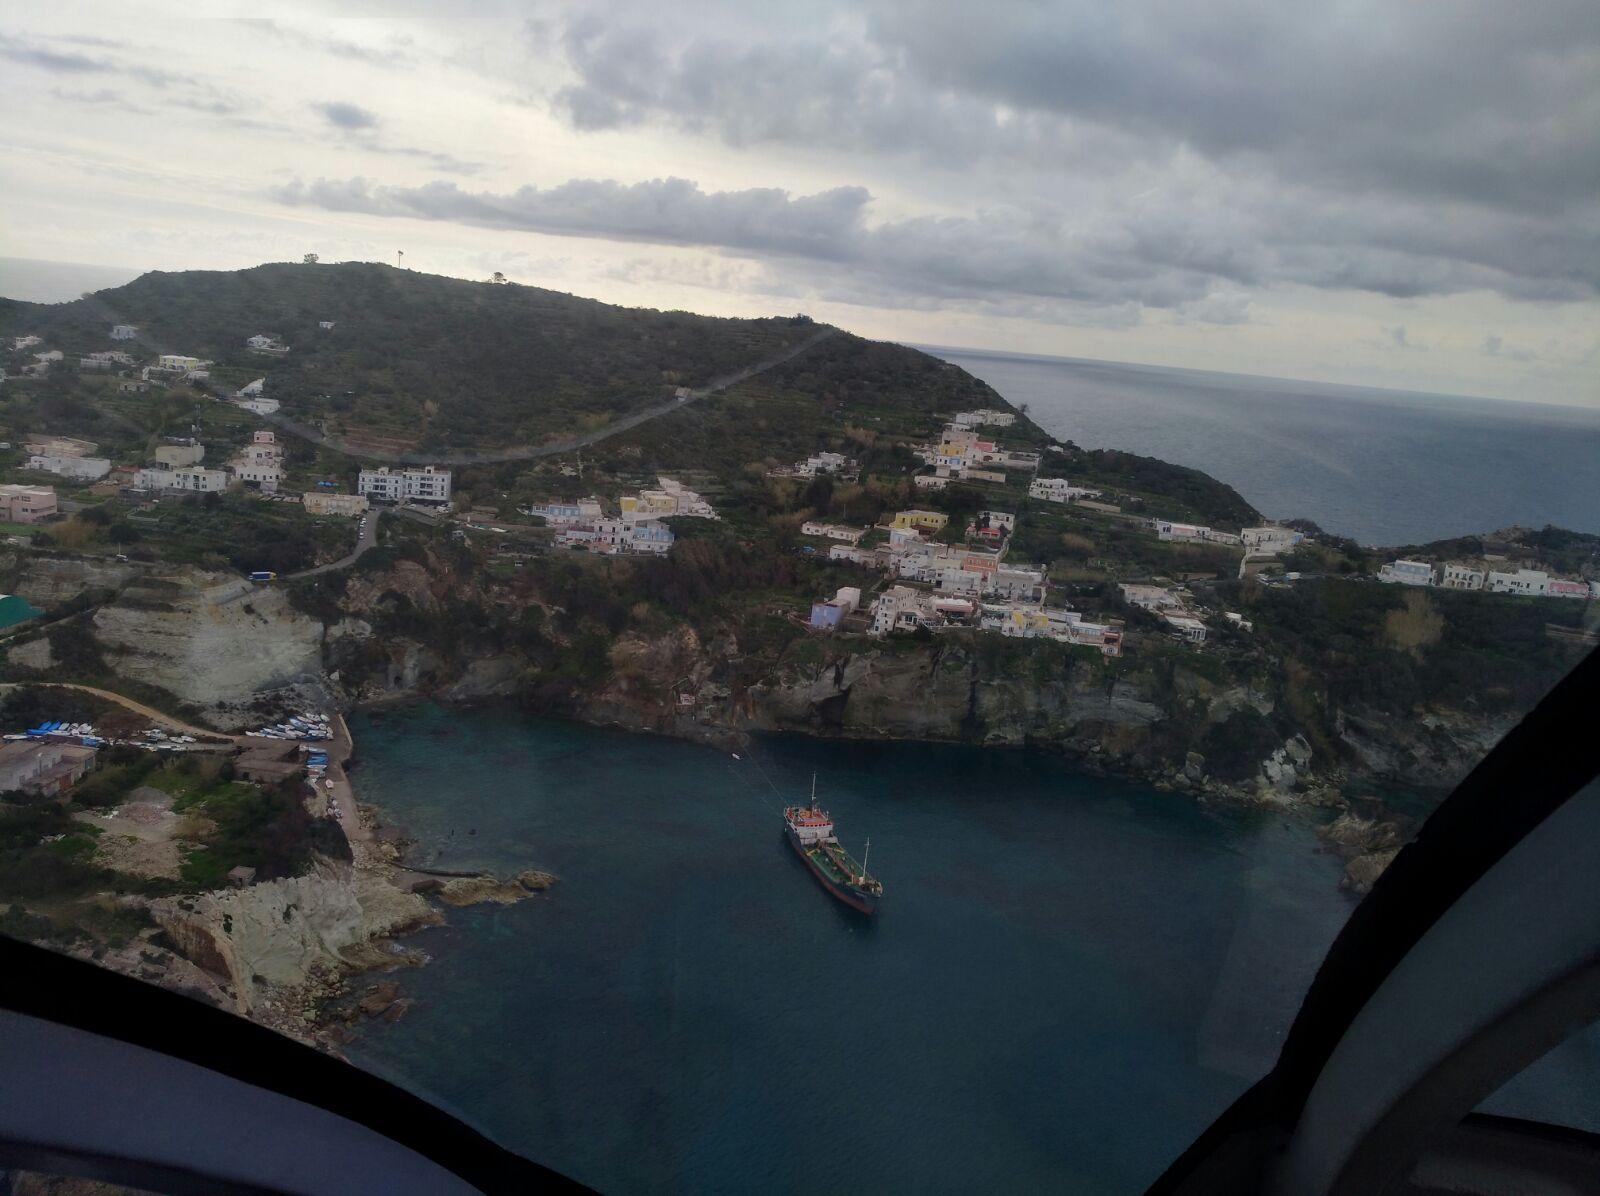 Vista elicottero